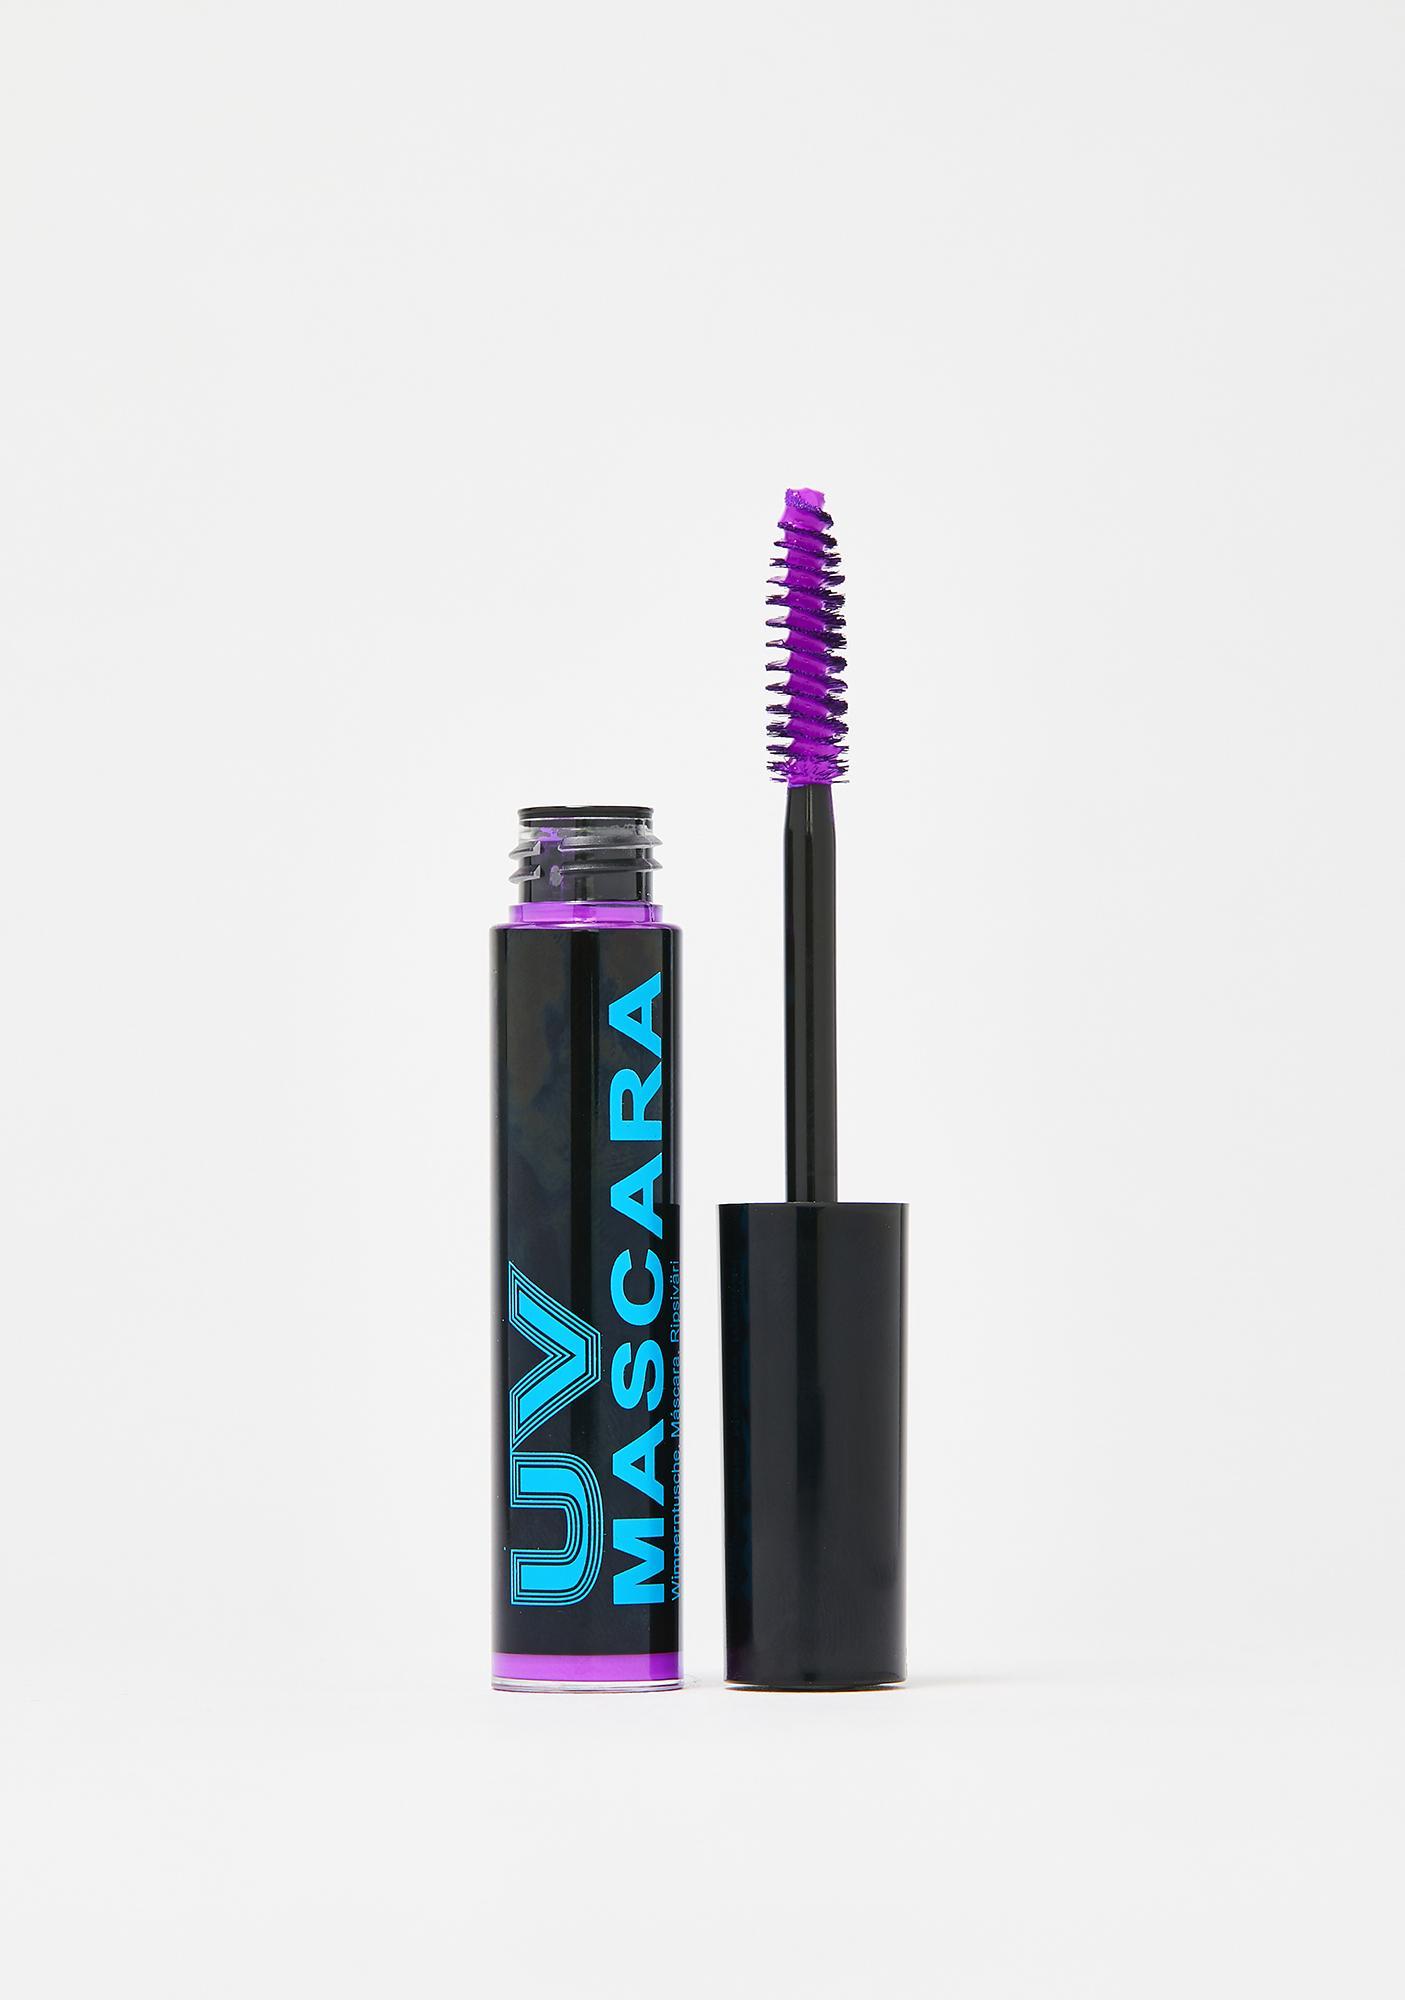 Stargazer Drank Sonic Wind UV Neon Mascara